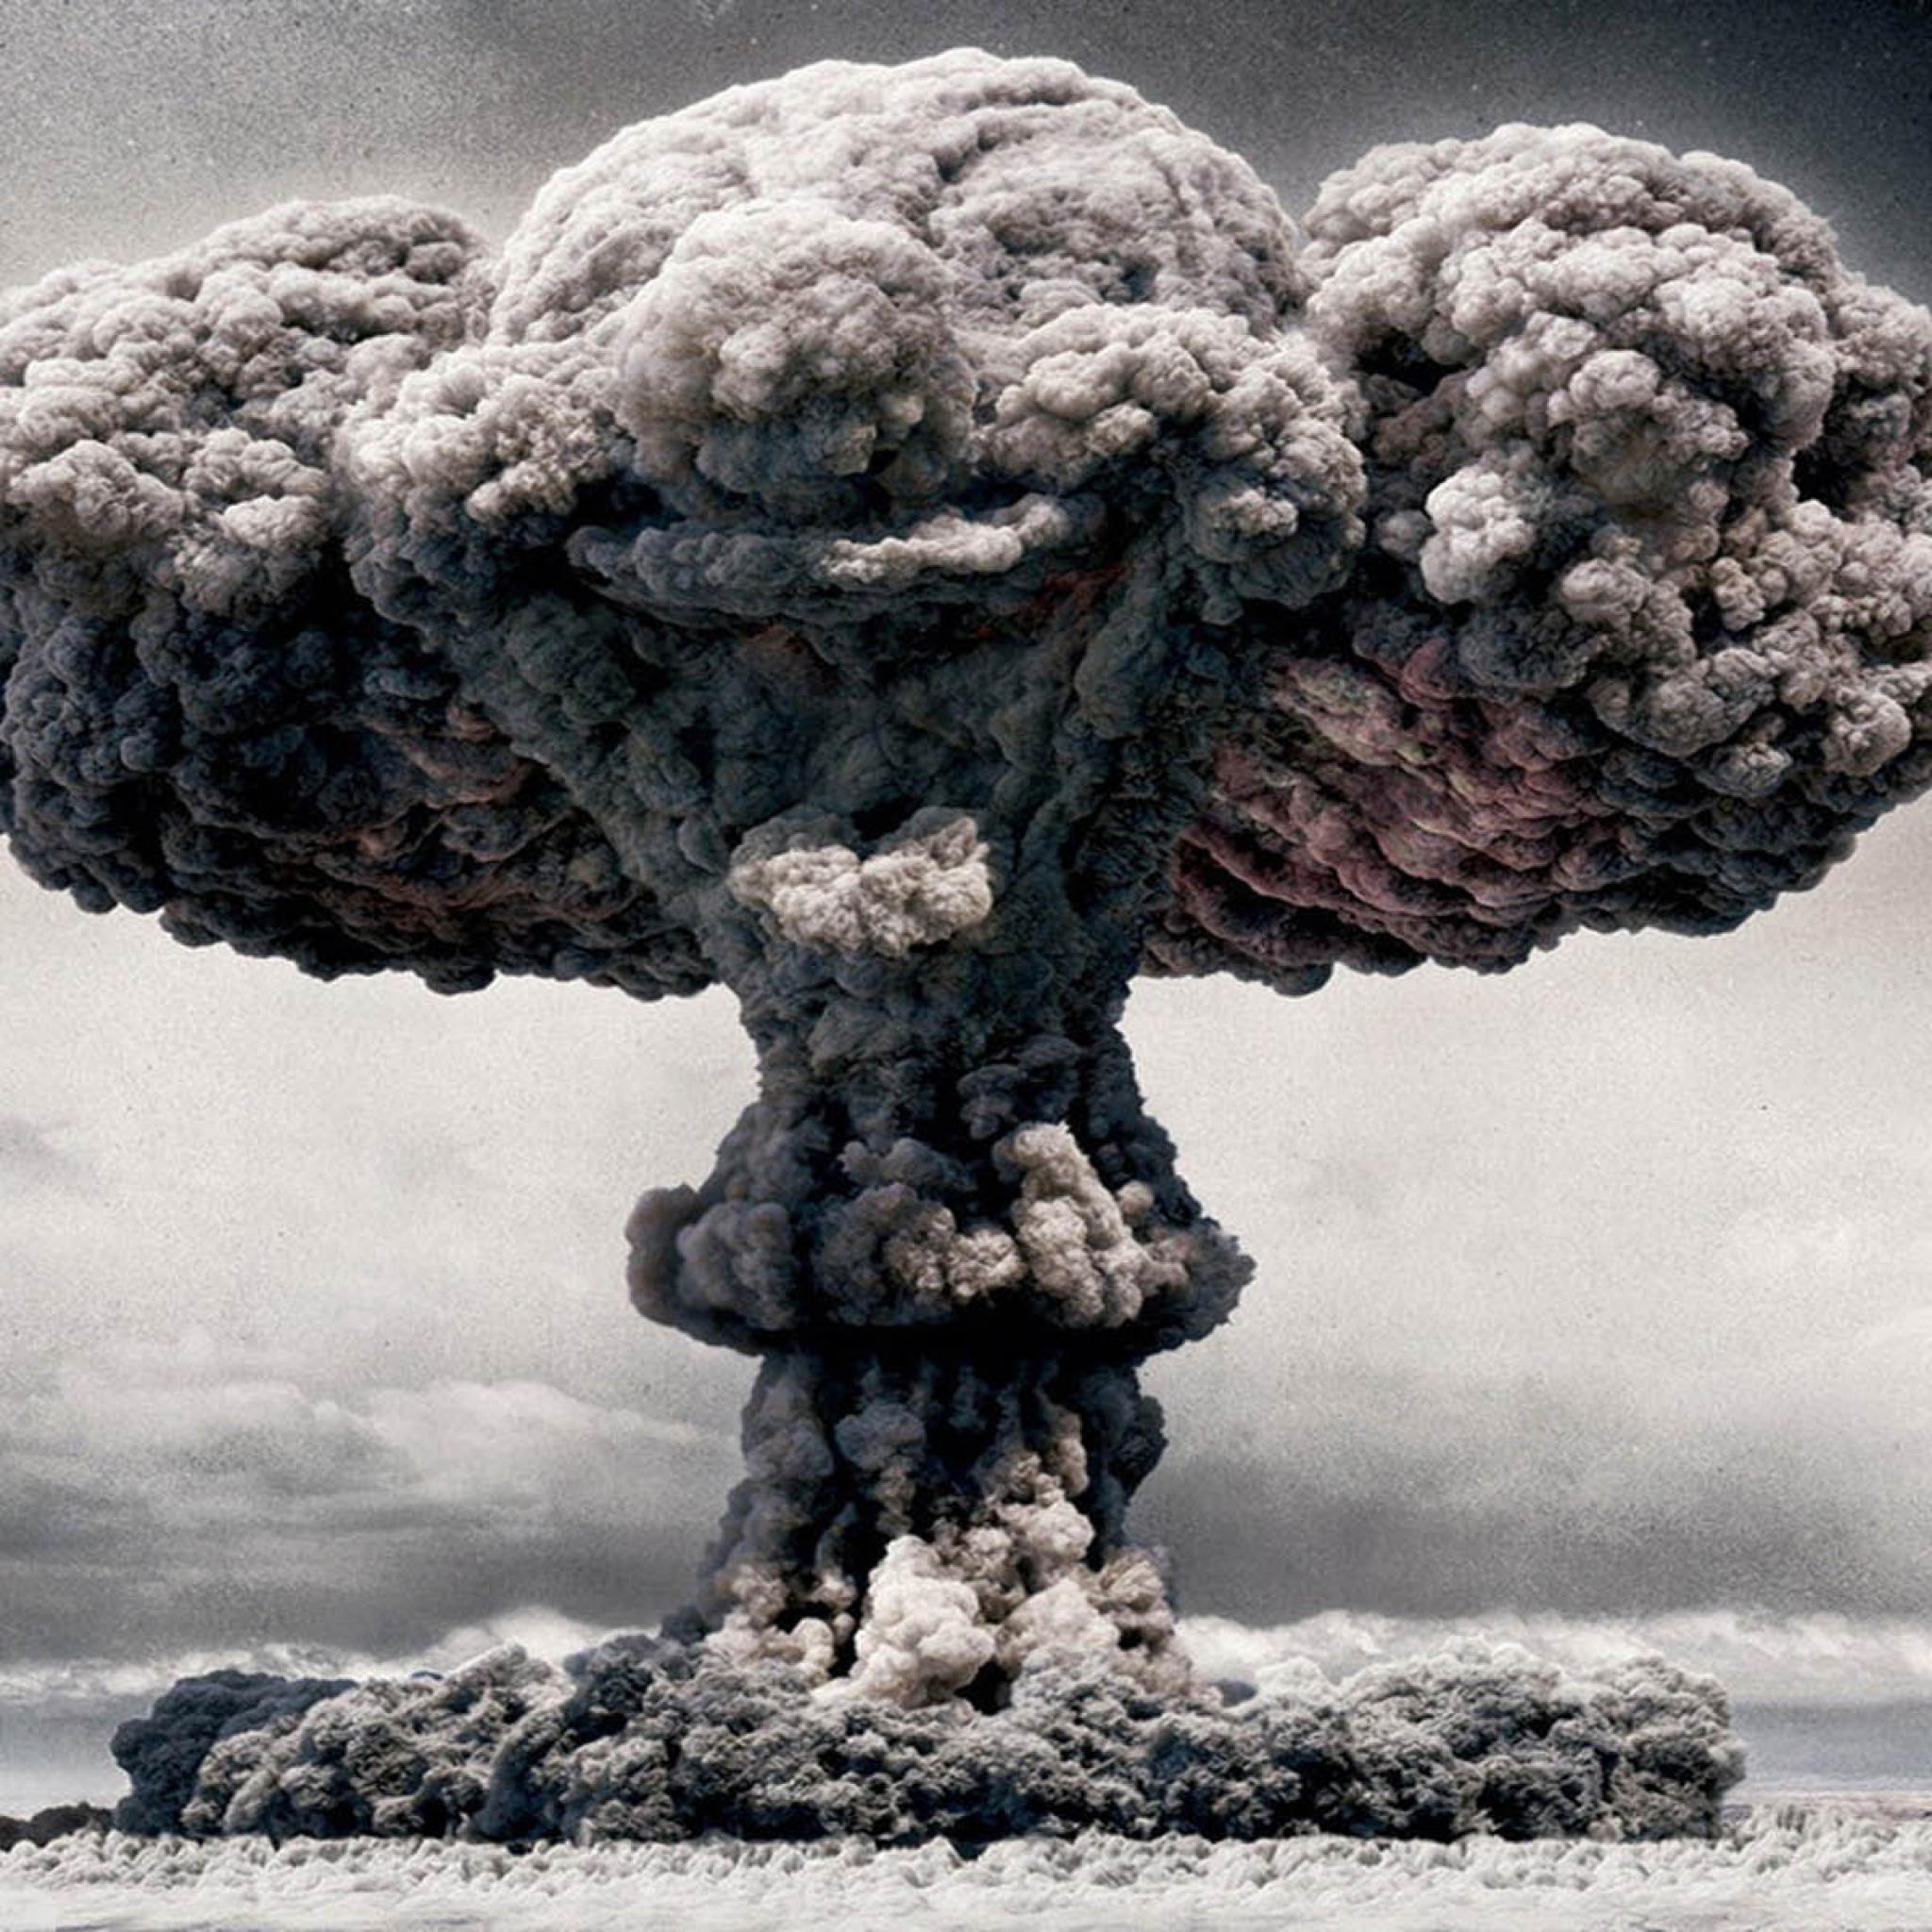 Eruption clipart mushroom cloud Cloud Atomic  Best 15